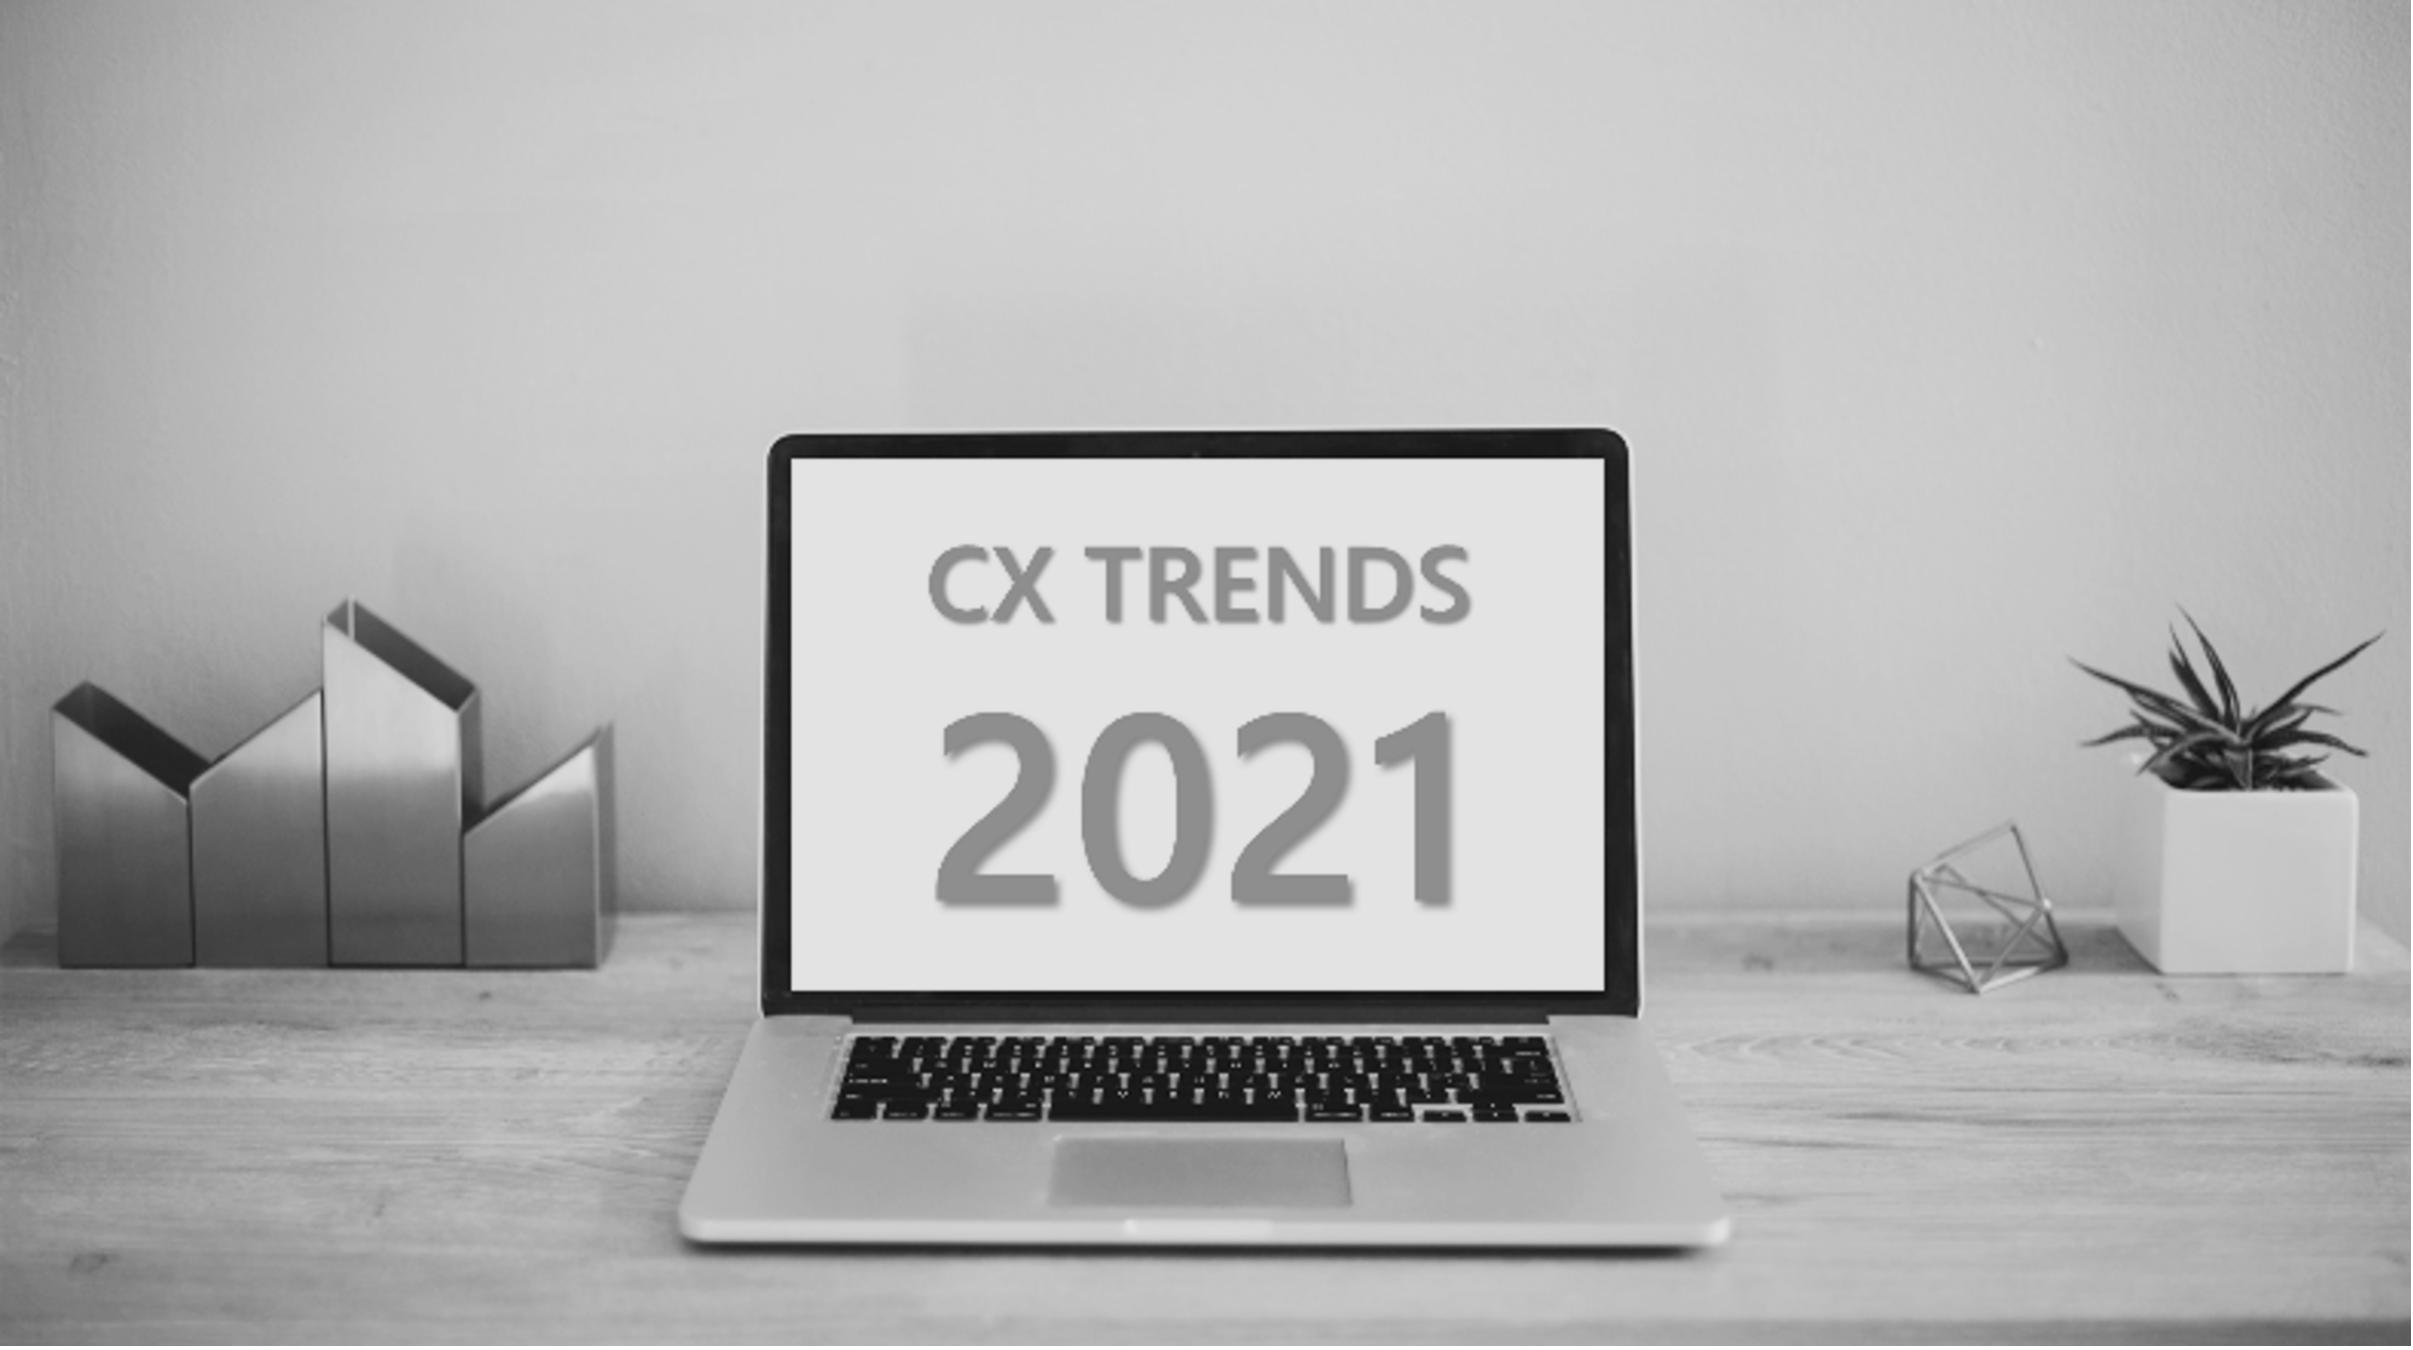 CX-TRENDS